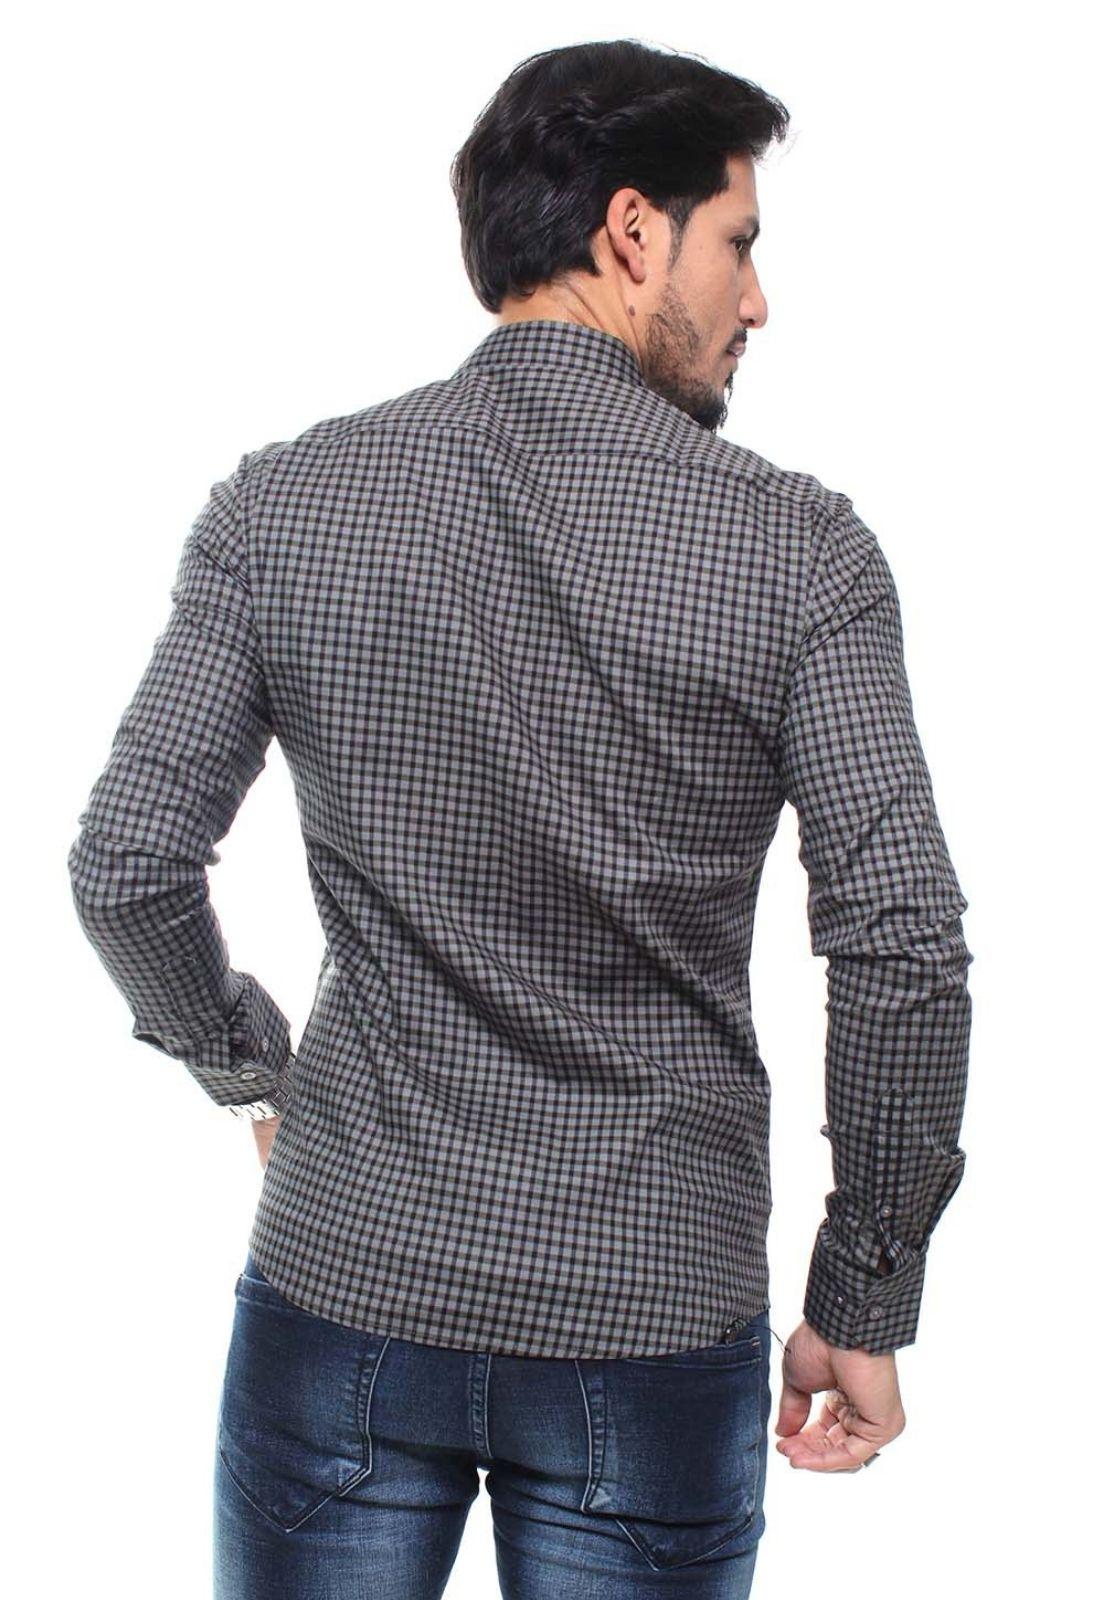 Kit 3 Camisas Masculina Manga Longa Crocker - 47159/47160/47158 Estampas Variadas  - CROCKER JEANS